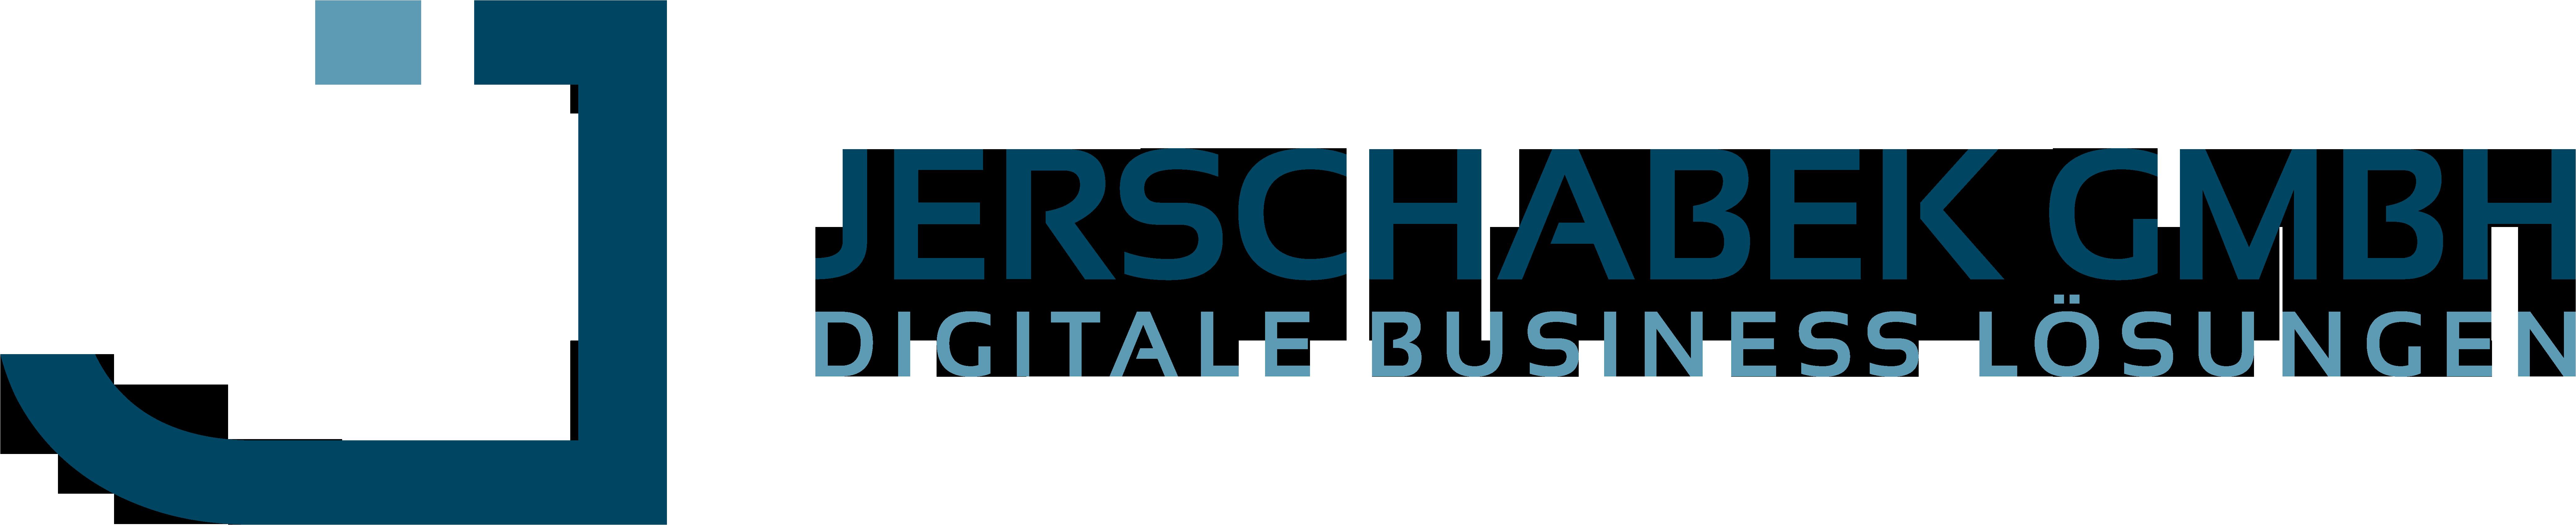 Jerschabek GmbH